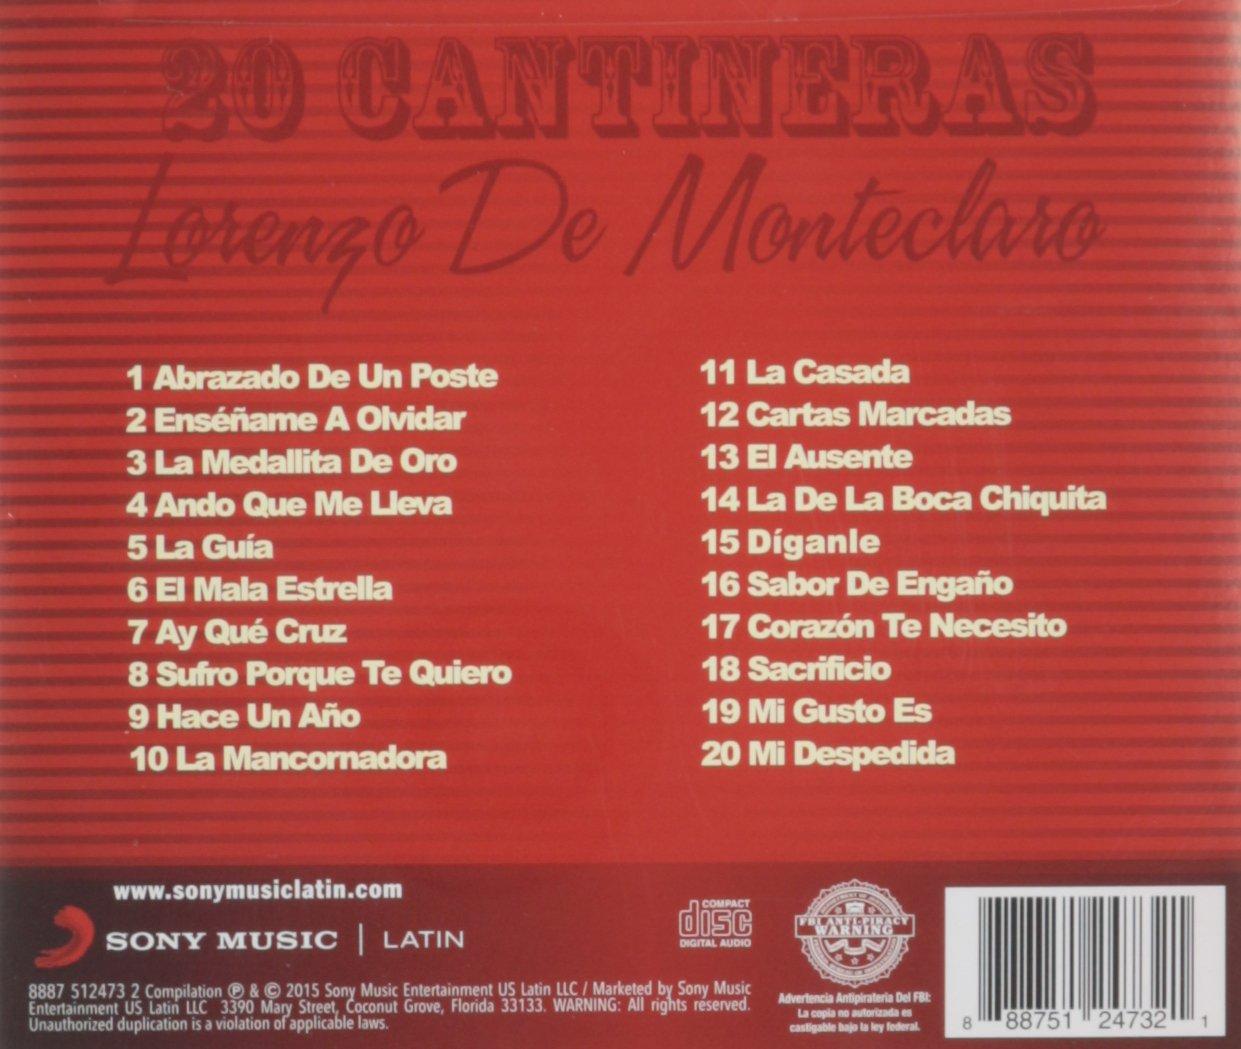 Lorenzo de Monteclaro - 20 Cantineras - Amazon.com Music